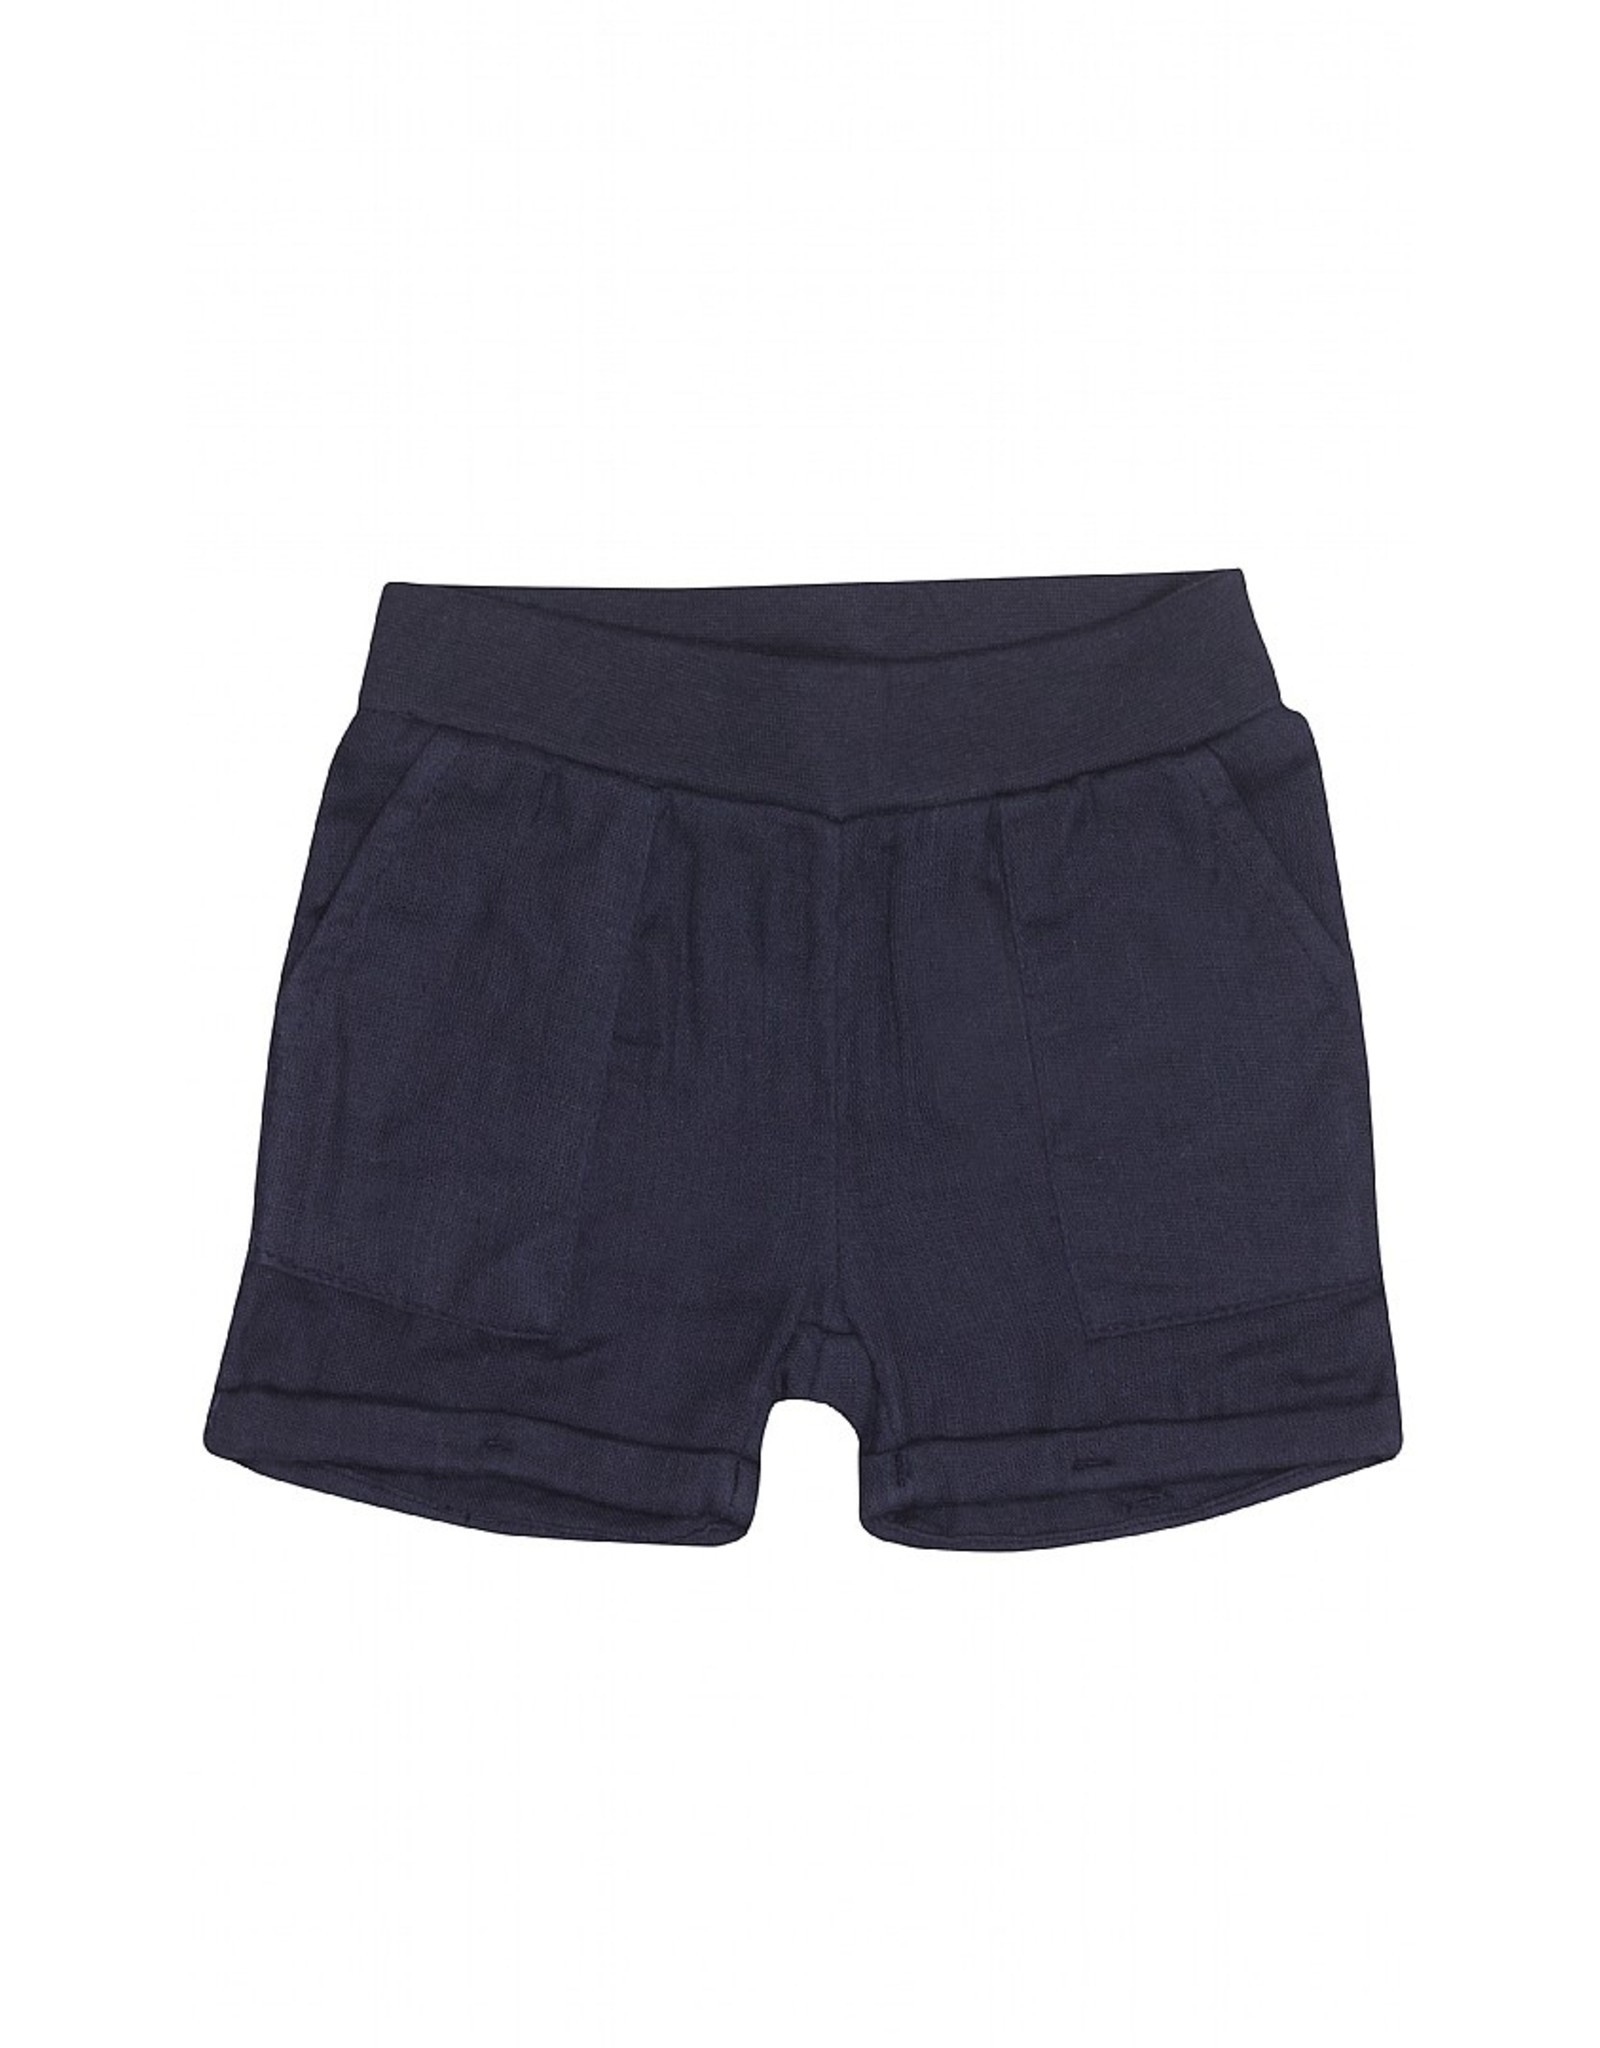 KIDS UP Kids Up Alfie Shorts